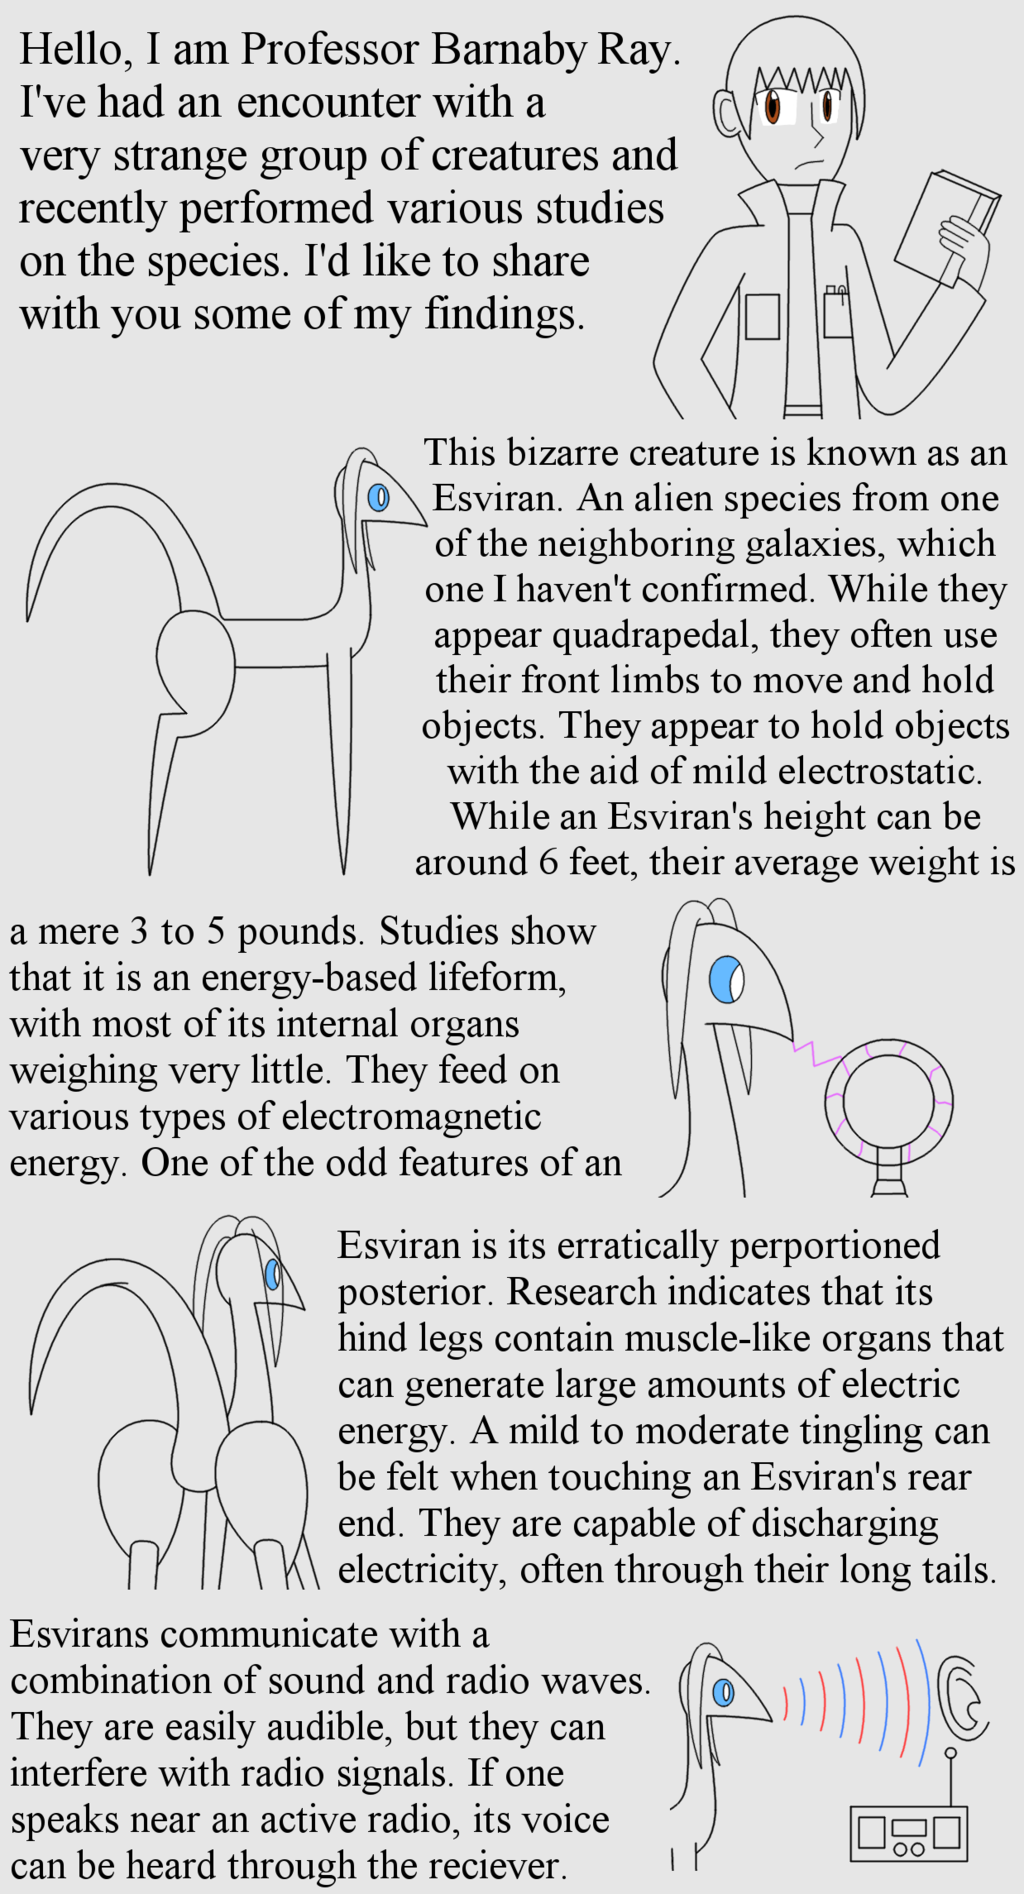 Esviran Research Page 1